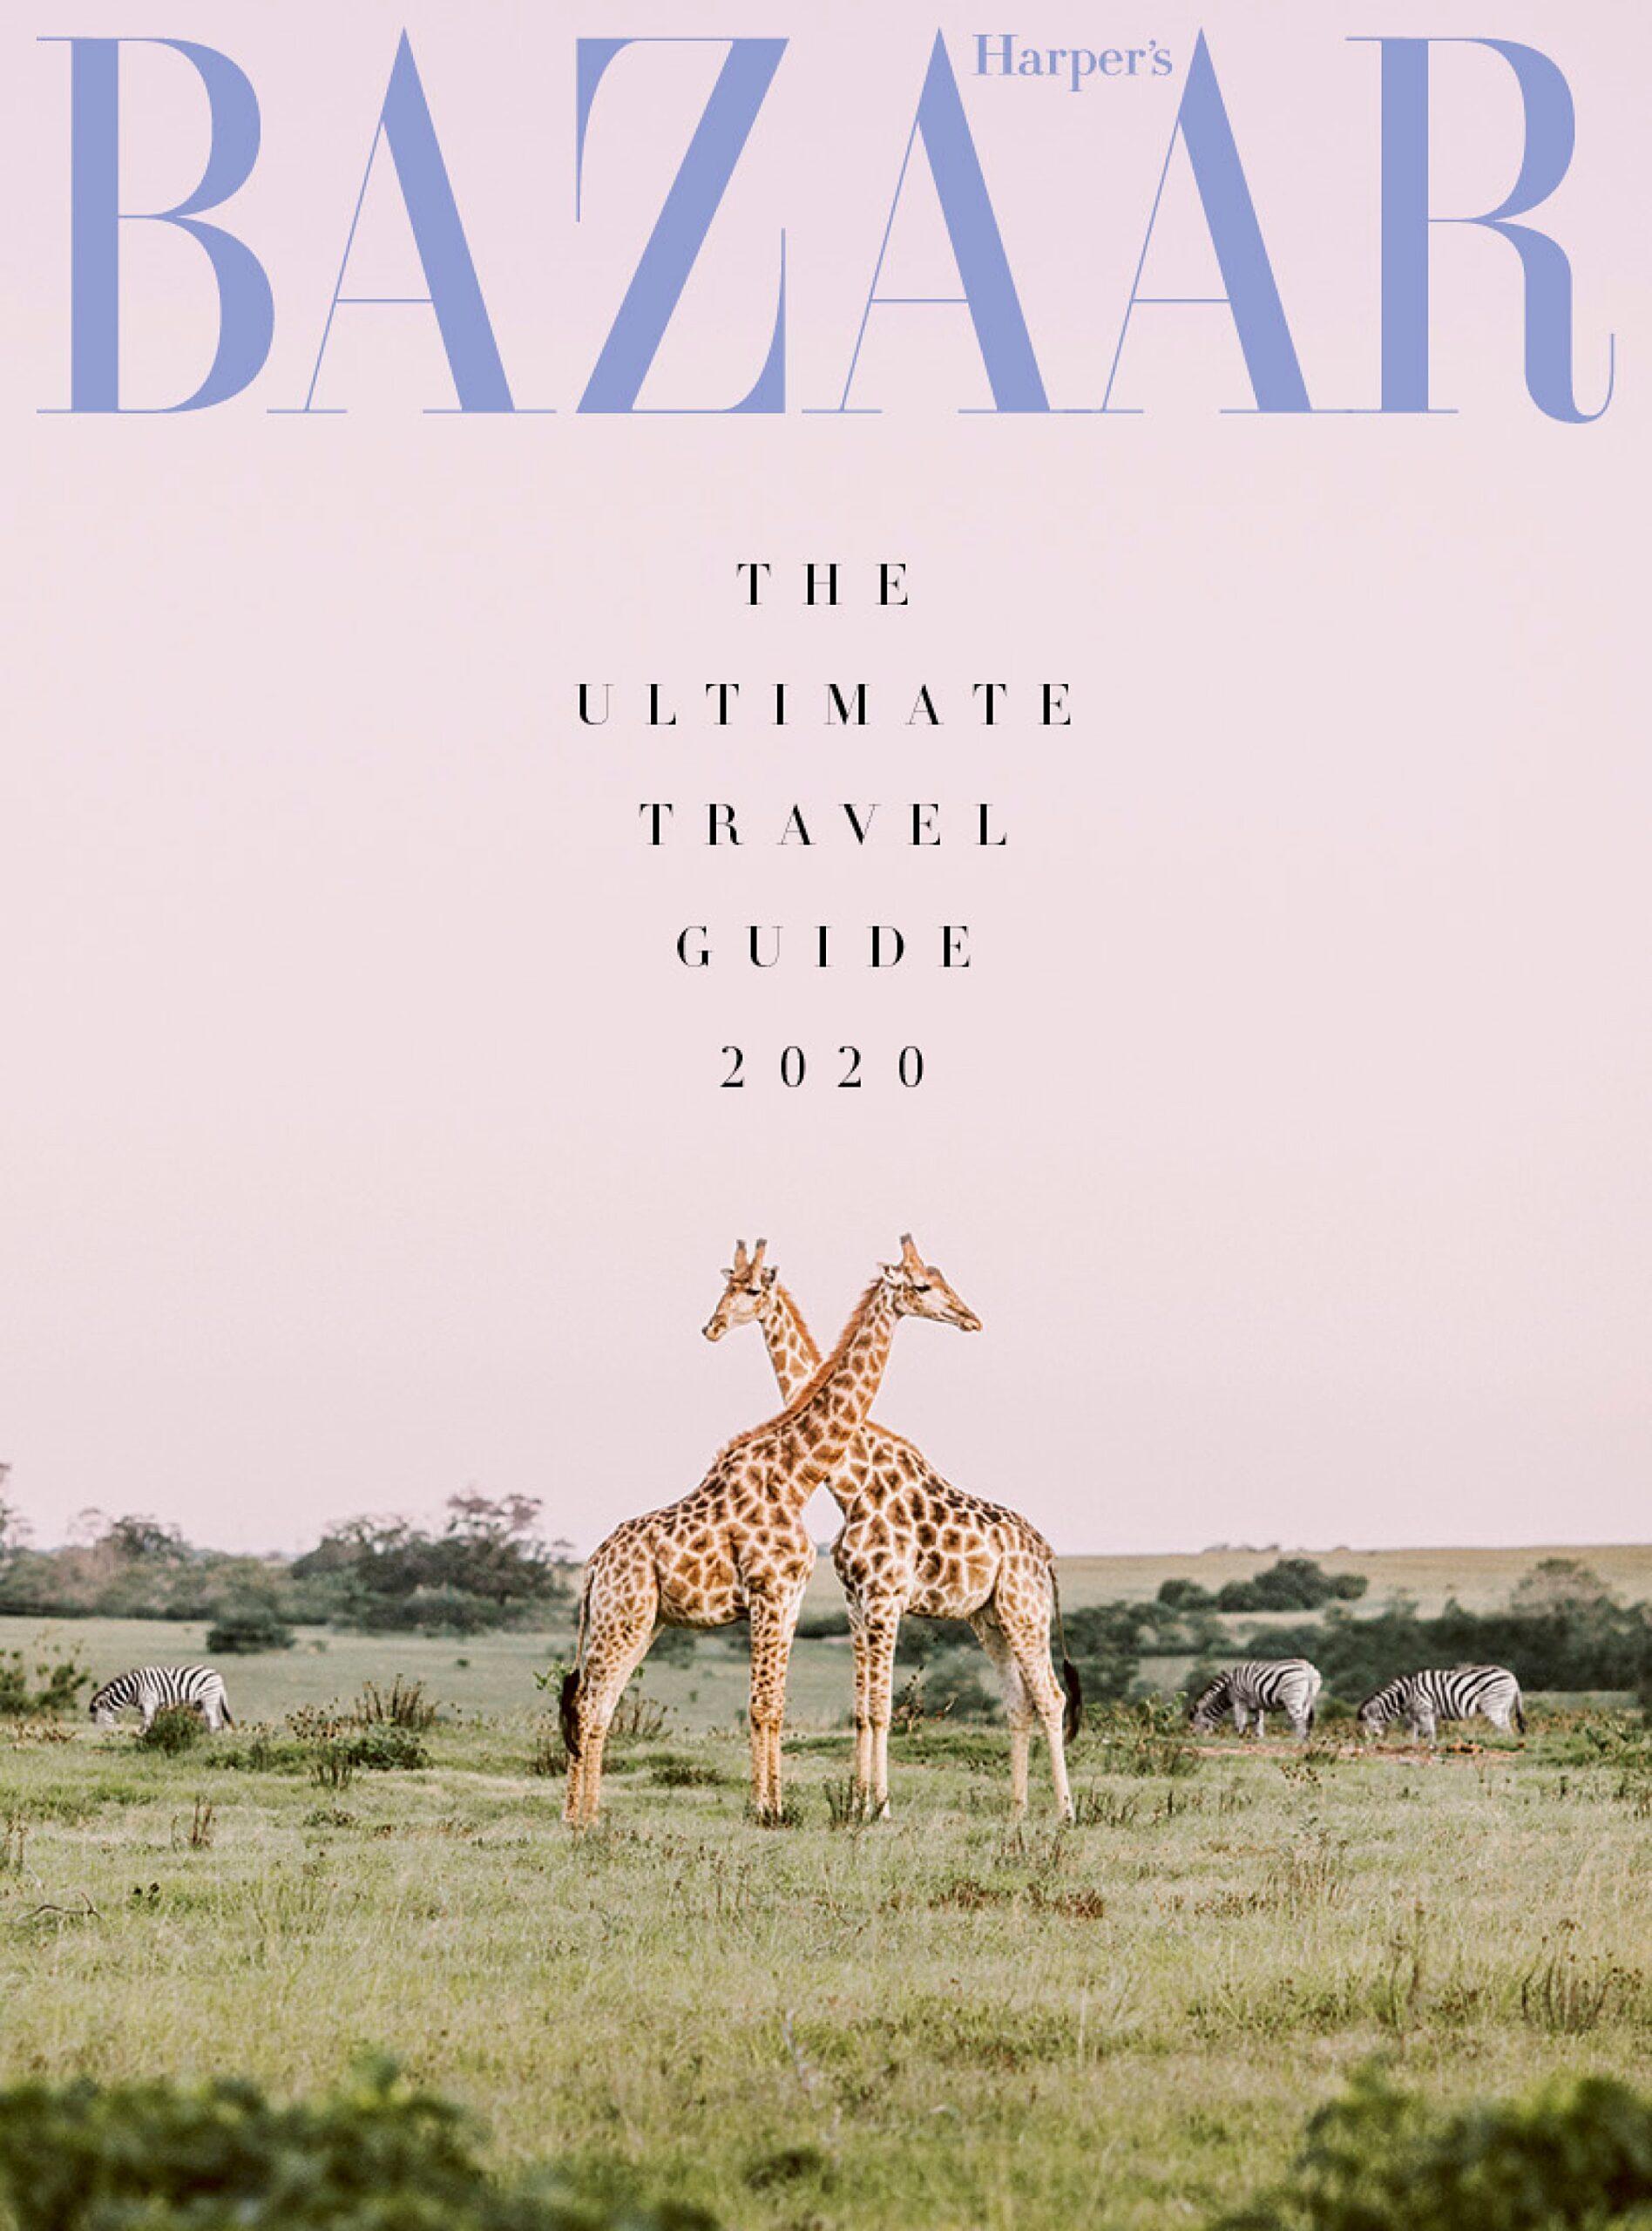 Harpers Bazaar Travel Supplement 2020 - Holly Clark Photography